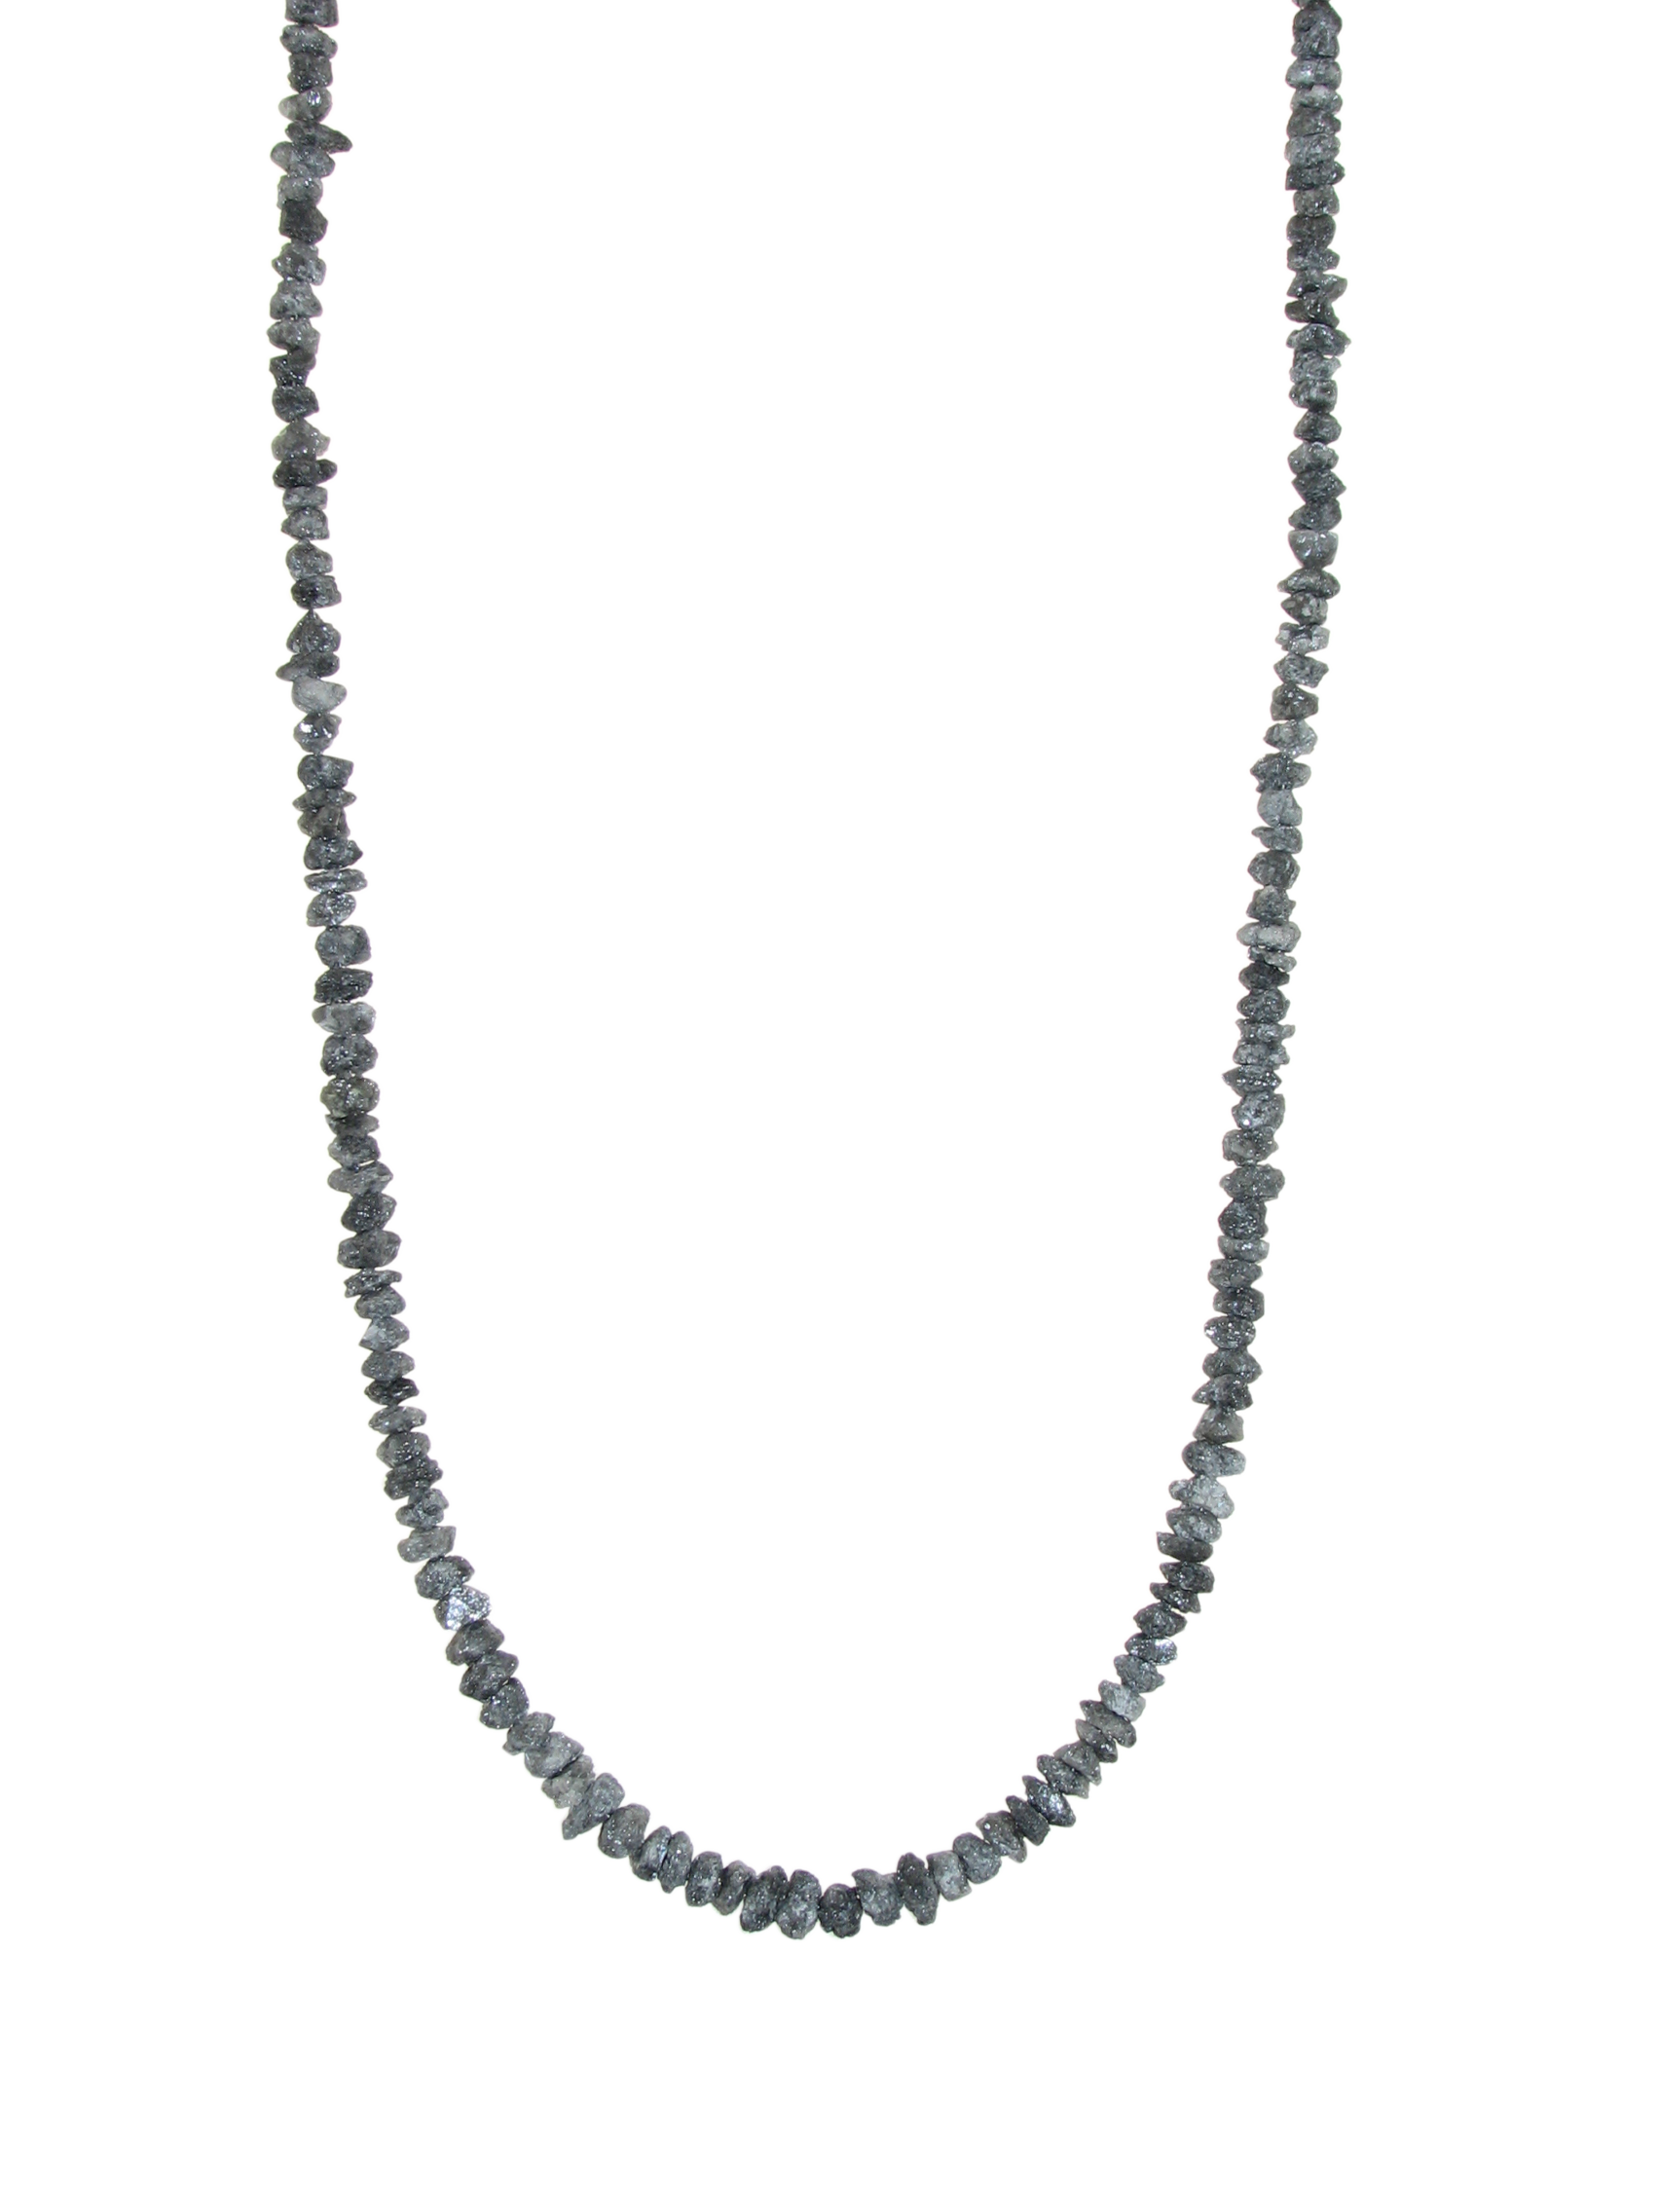 Collier mit Rohdiamanten, platingrau